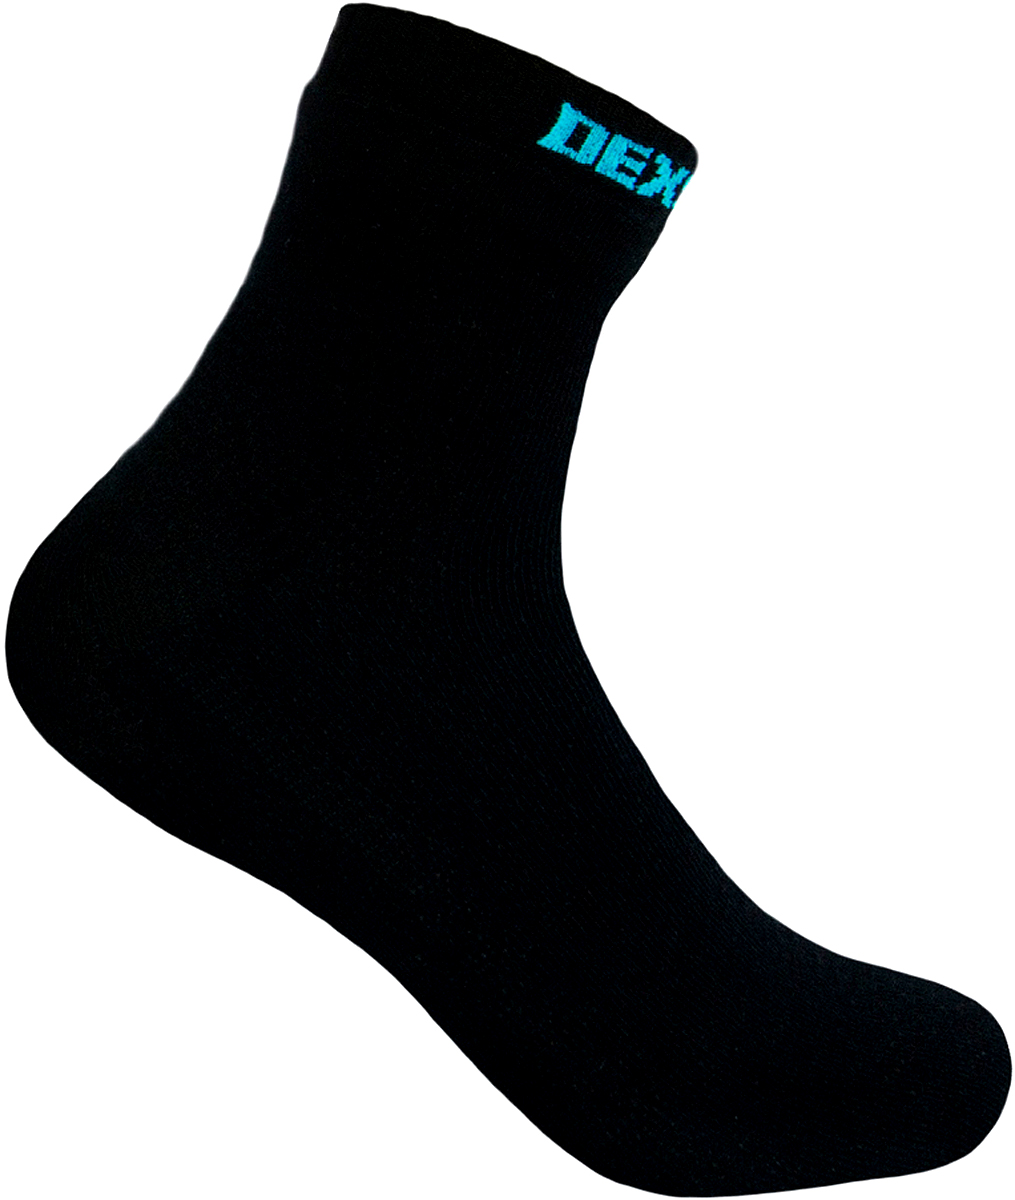 Носки водонепроницаемые Dexshell, цвет: черный. DS663BLK. Размер XL (47/49) носки kross krt tall размер xl черный t4cod000283xlbk